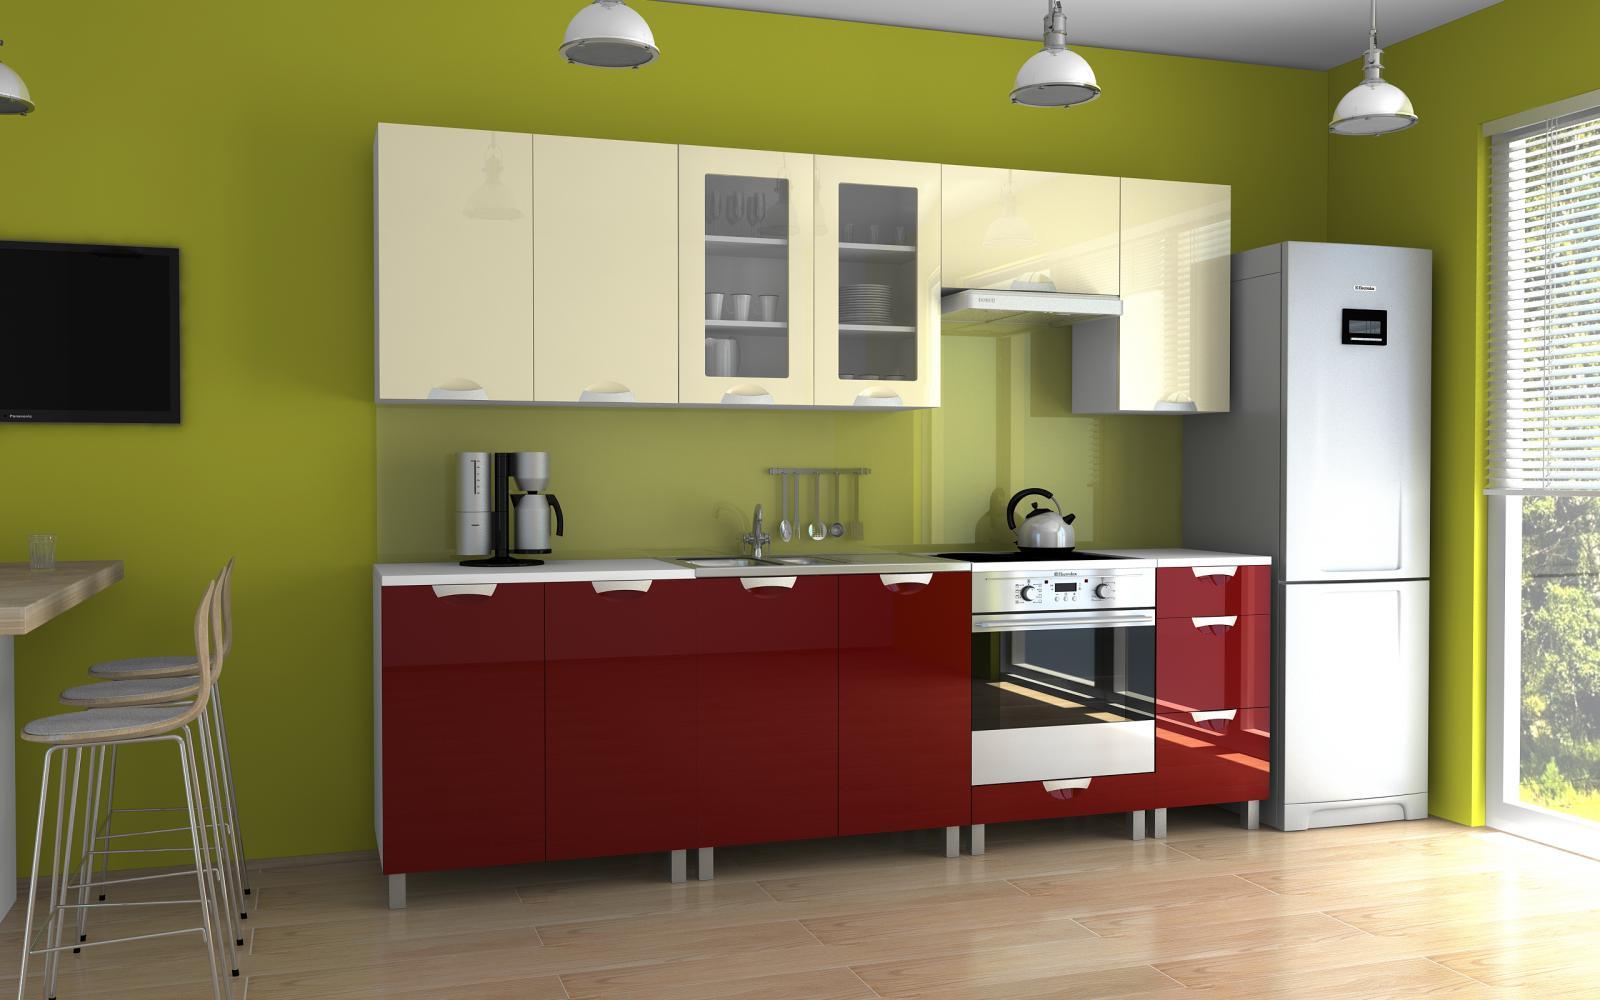 Kuchyňská linka Parkour MDR 260 vanilka/bordo lesk